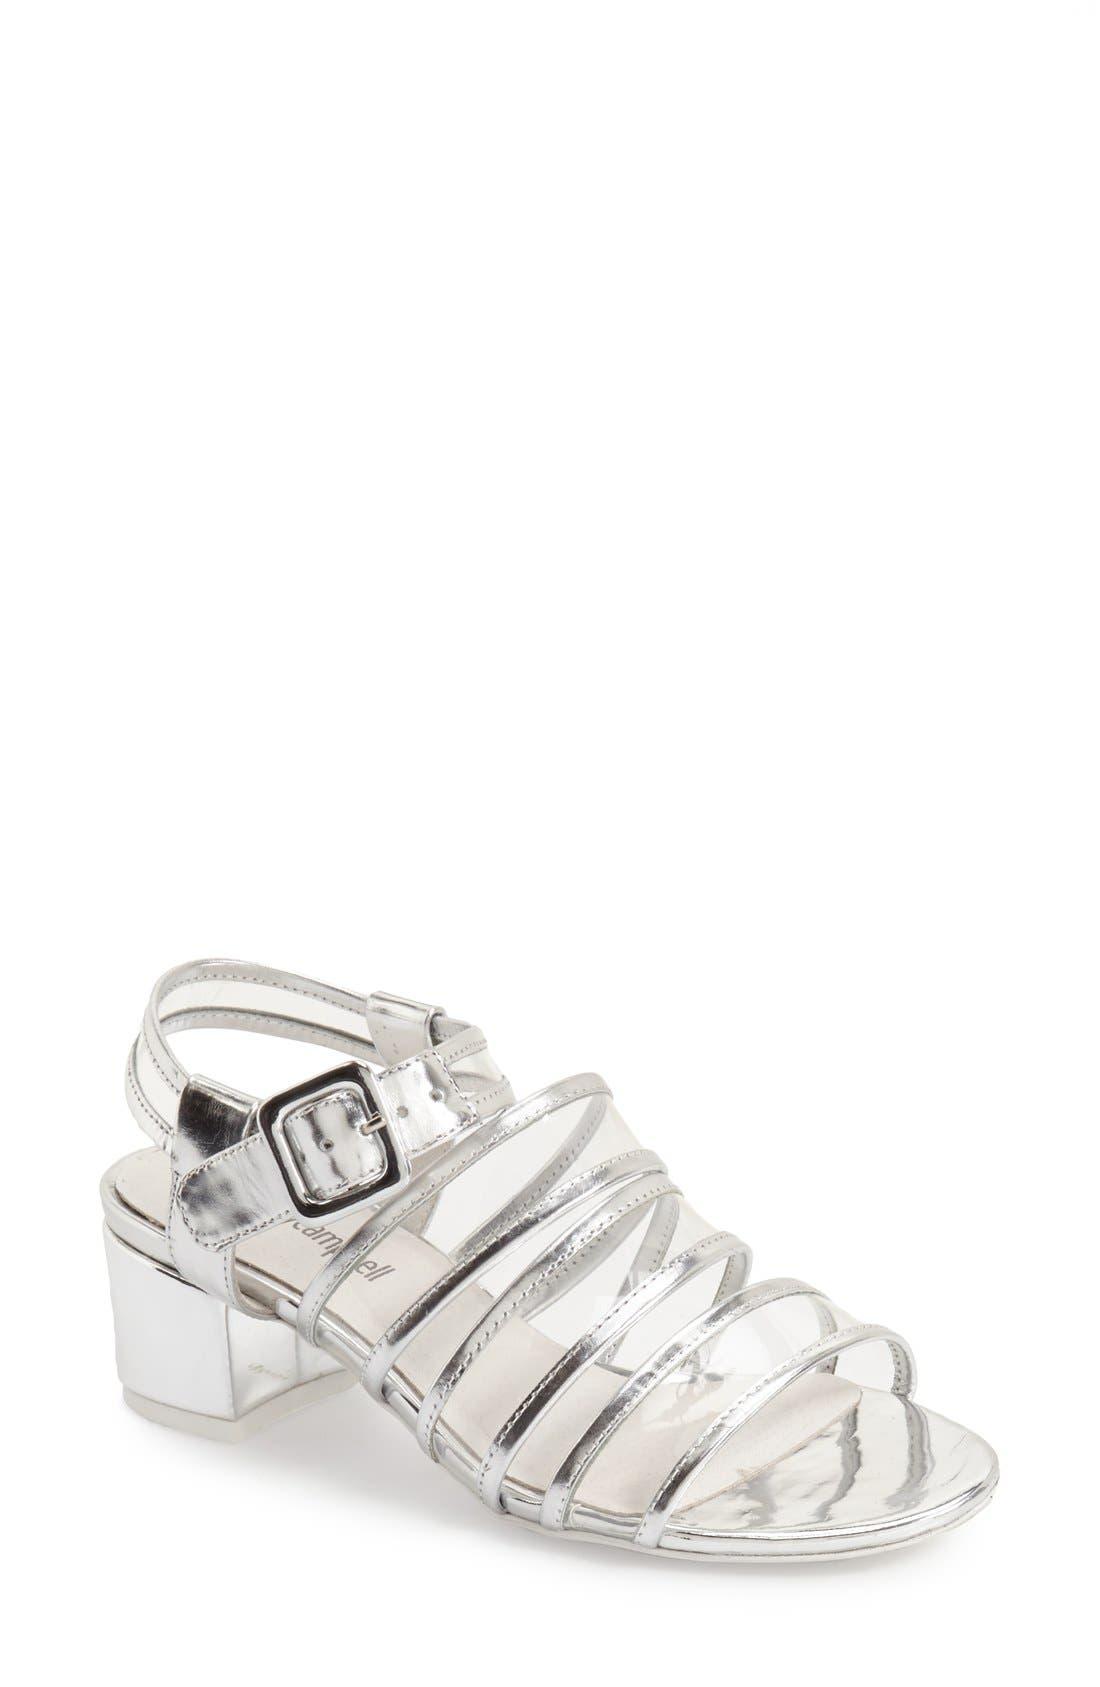 Main Image - Jeffrey Campbell 'Verina' Sandal (Women)